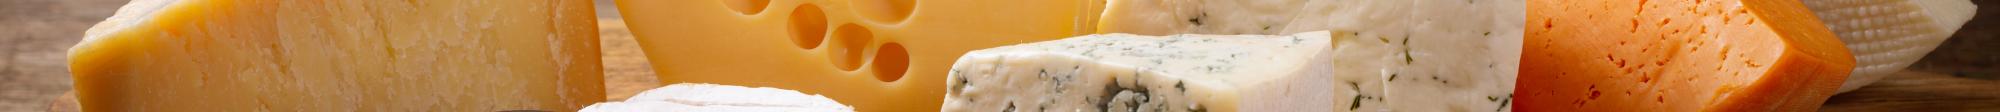 Comprar  quesos Belgica gourmet online | Mixtura Gourmet